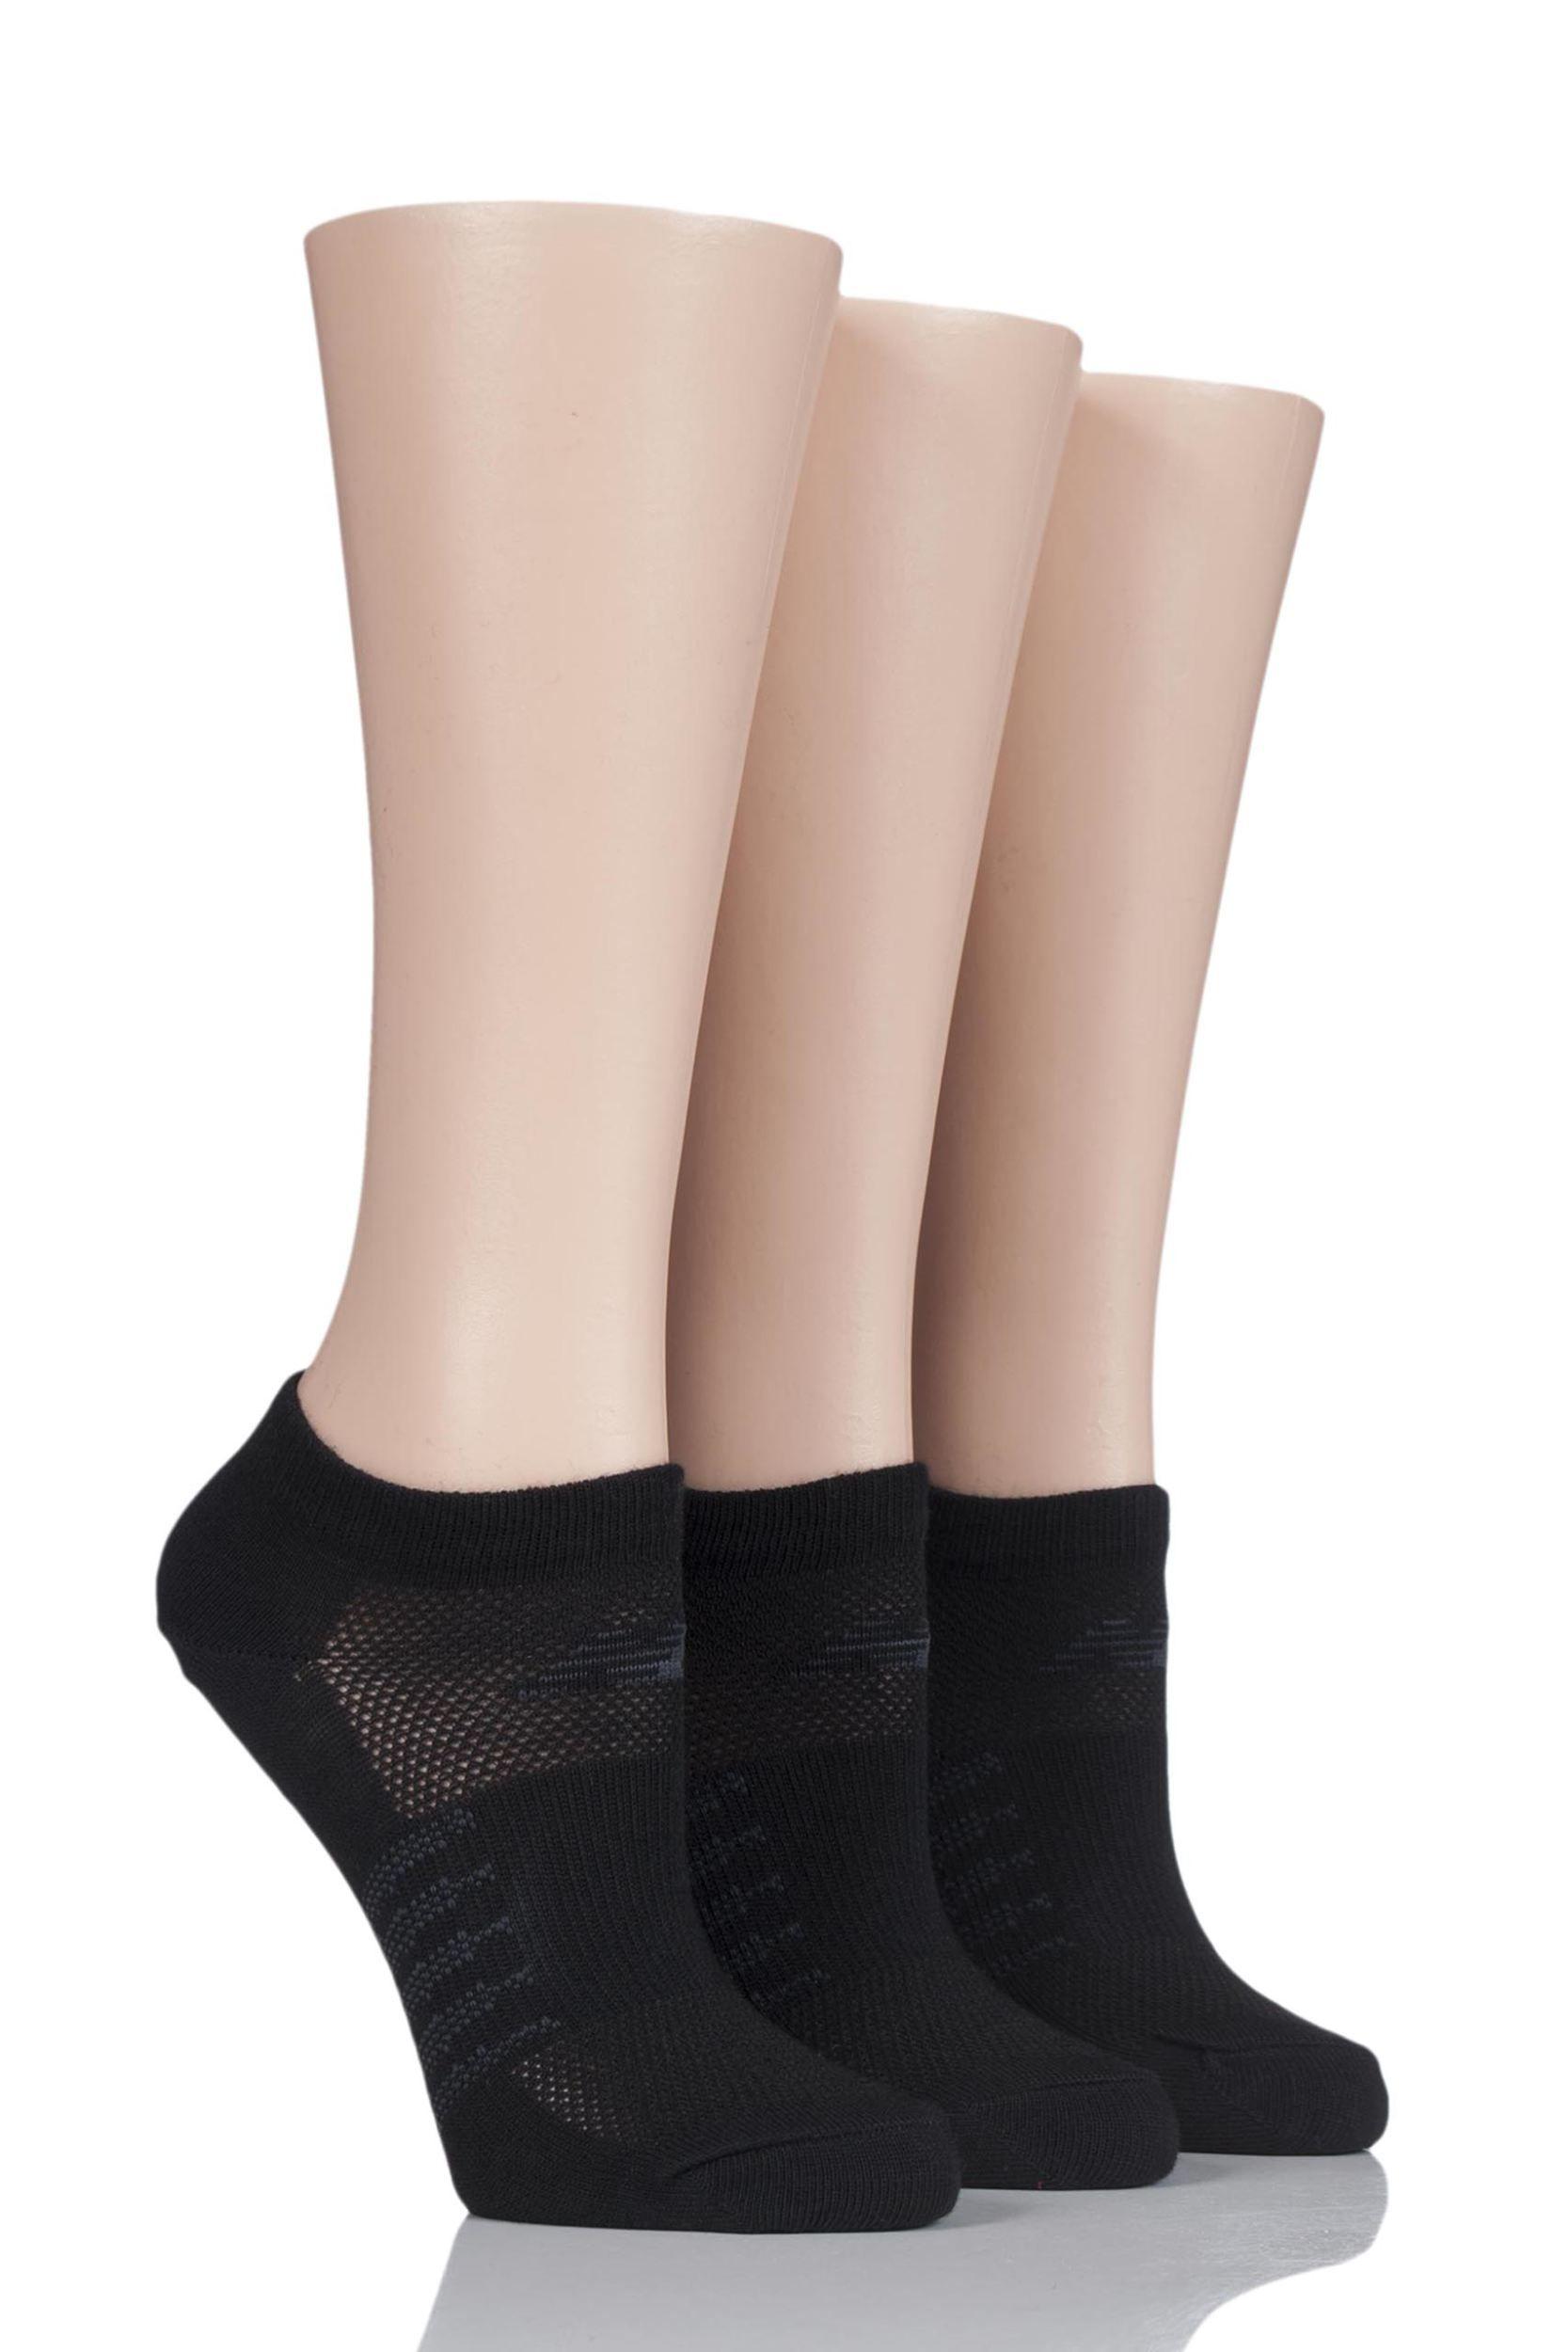 5b87e48420fcd Mens and Ladies 3 Pair New Balance Active Elements No Show Socks ...